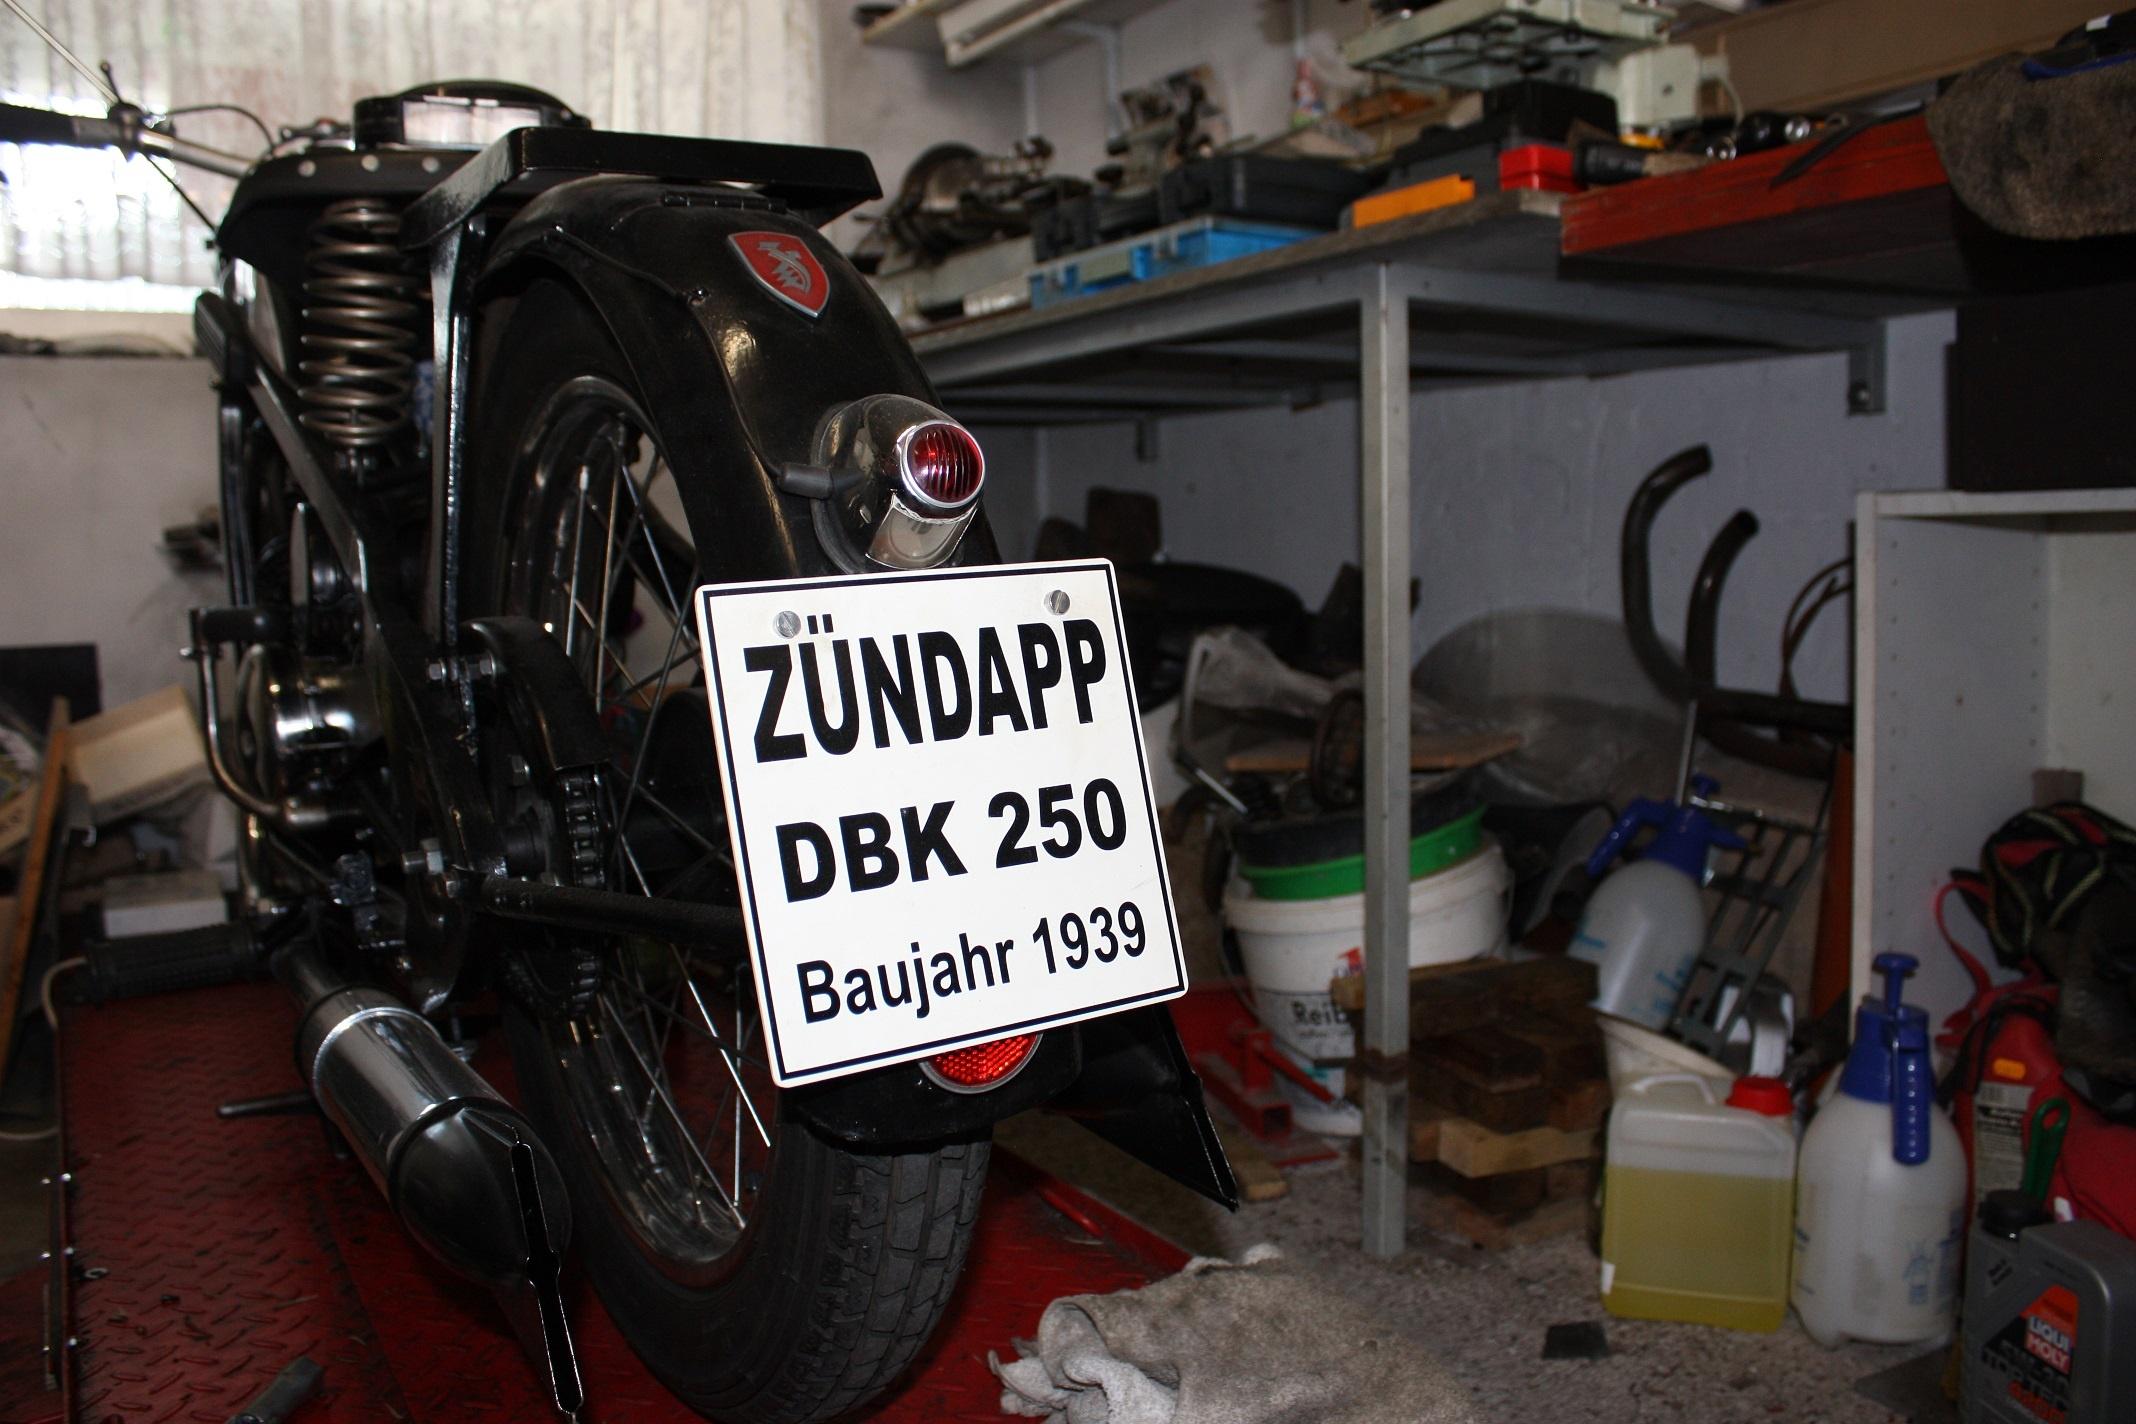 Brinkmann's oldest bike is a Zündapp DBK 250 from 1939.